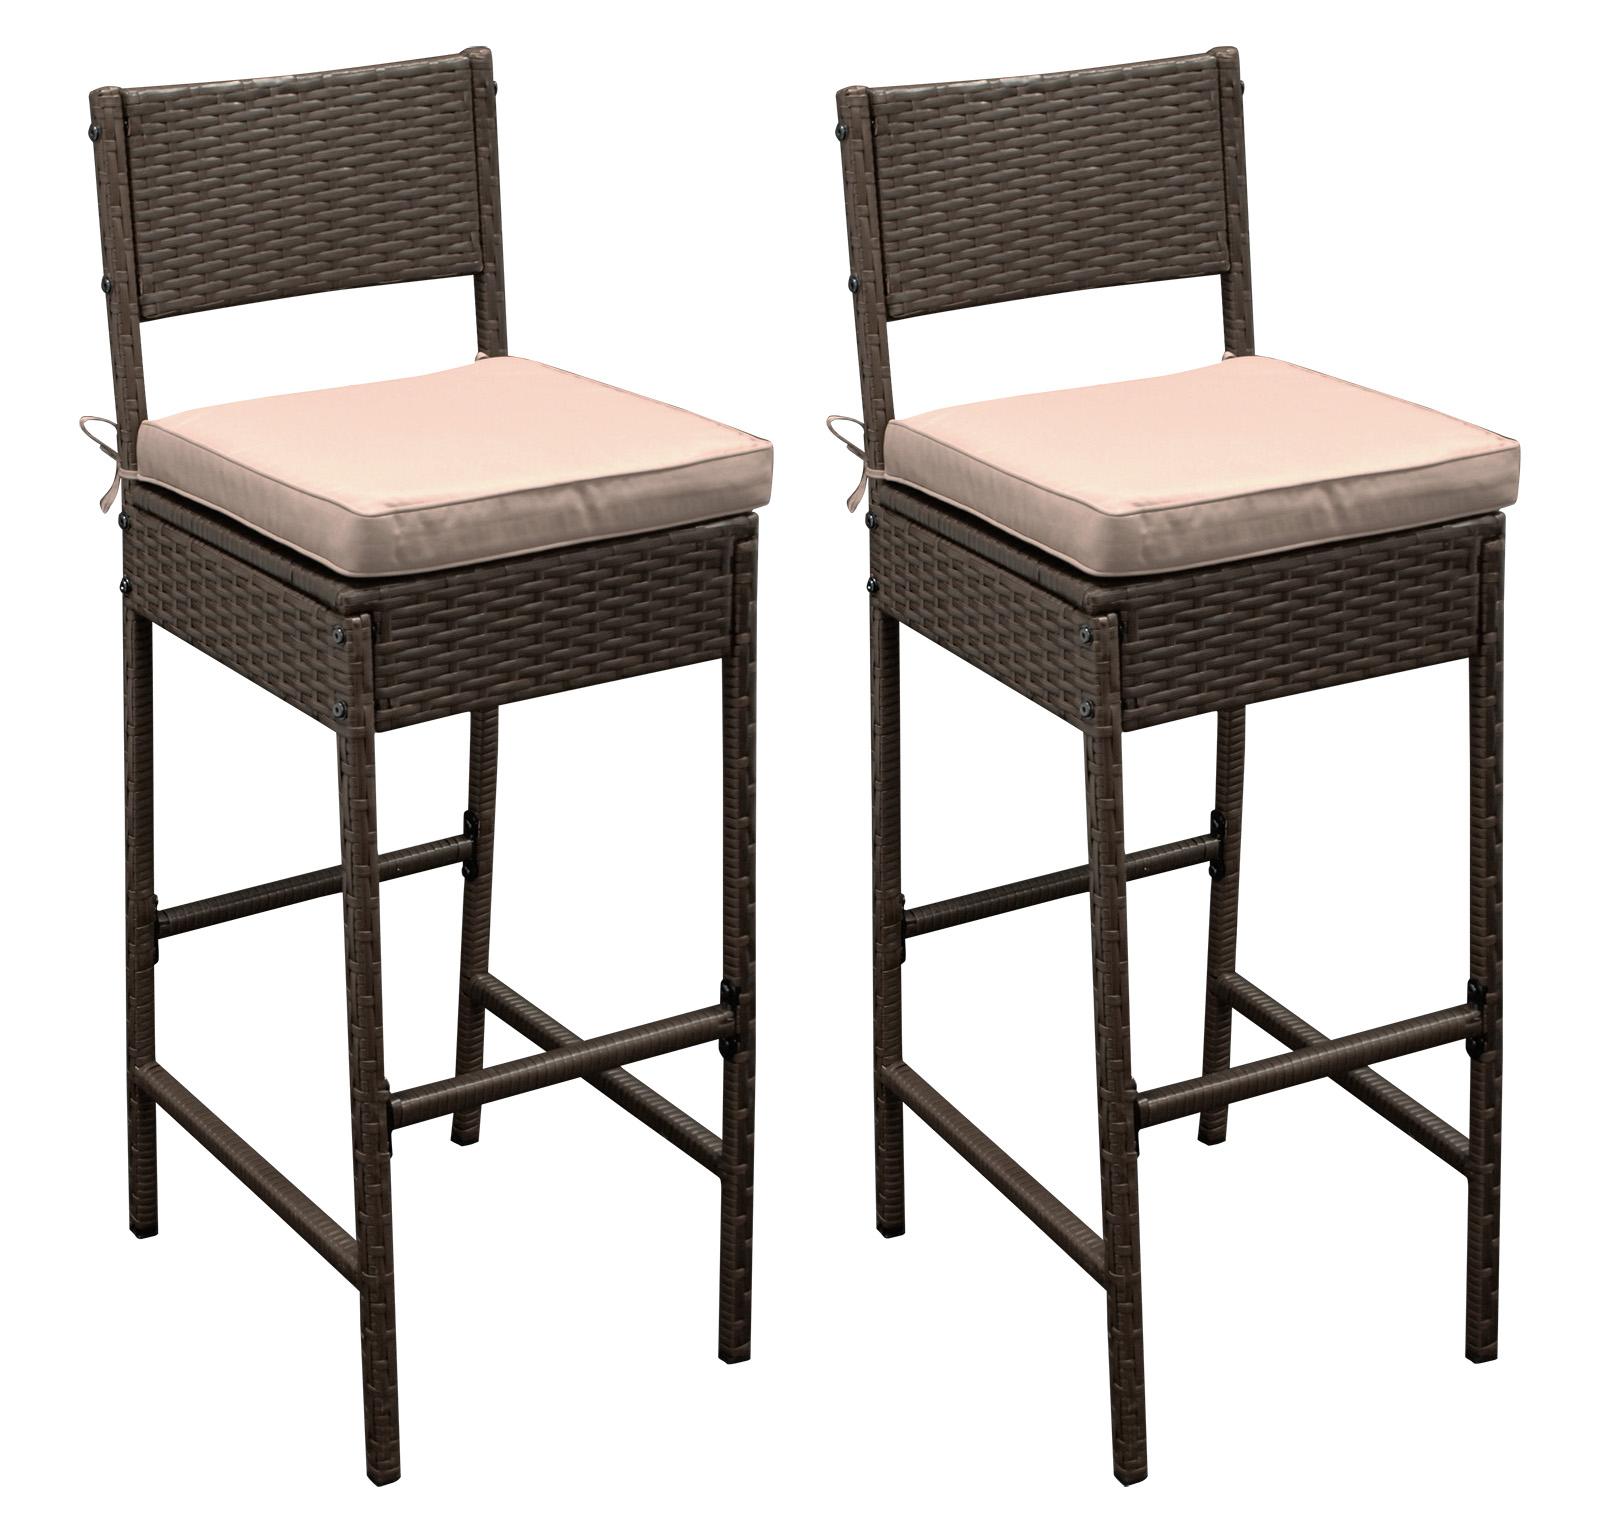 barset 7 teilig bartisch stehtisch barhocker barstuhl set. Black Bedroom Furniture Sets. Home Design Ideas